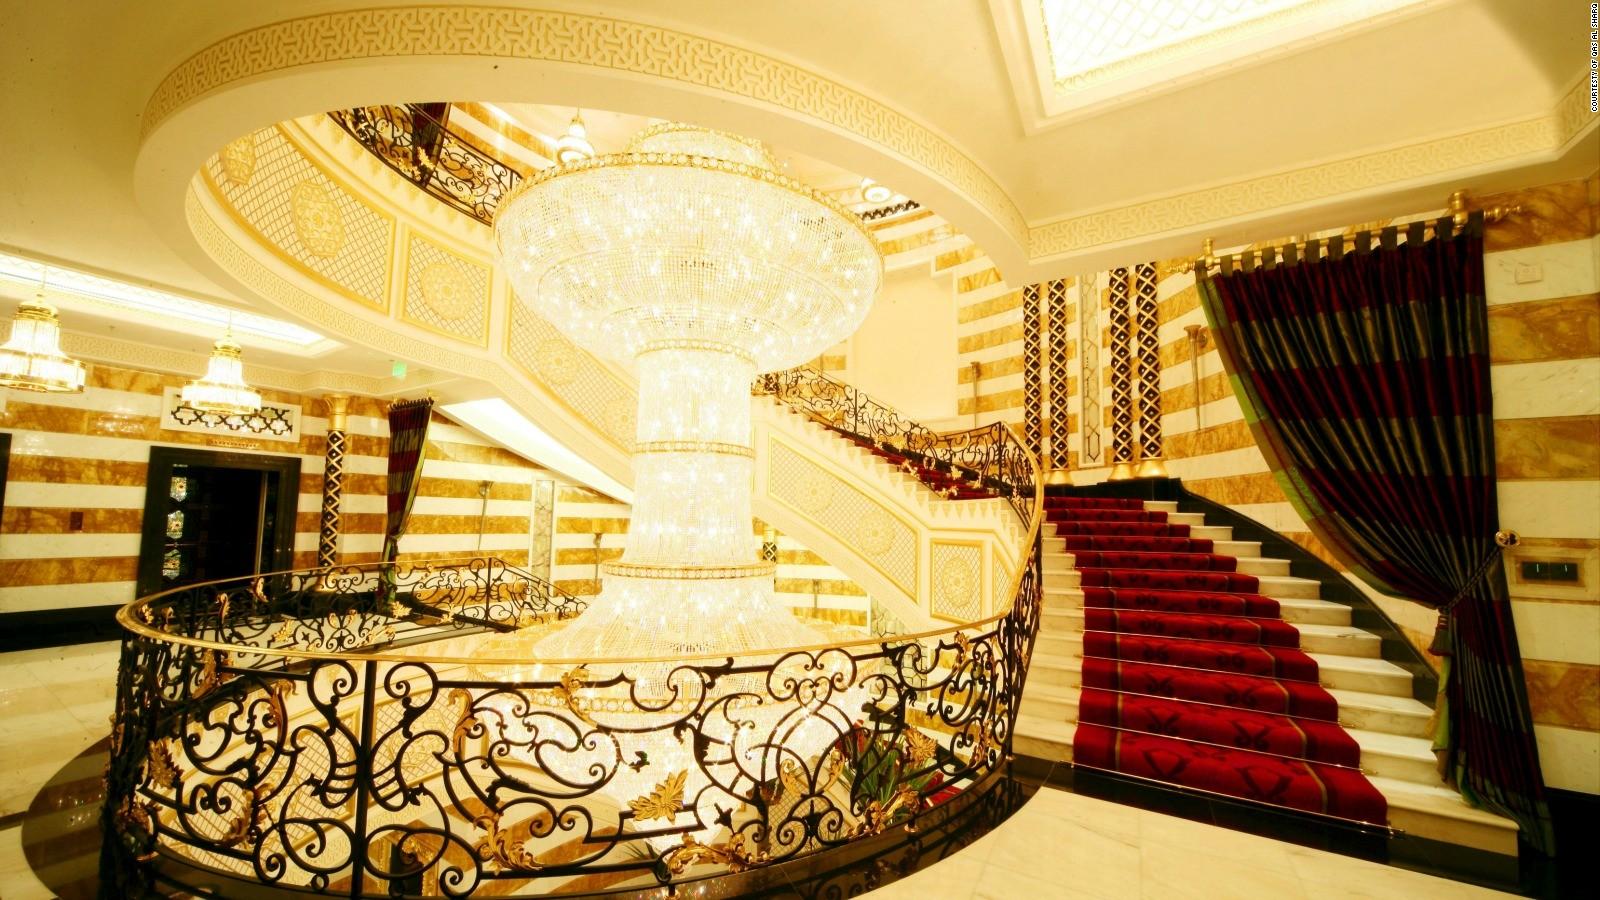 Luxury Hotel Lobby Stairs